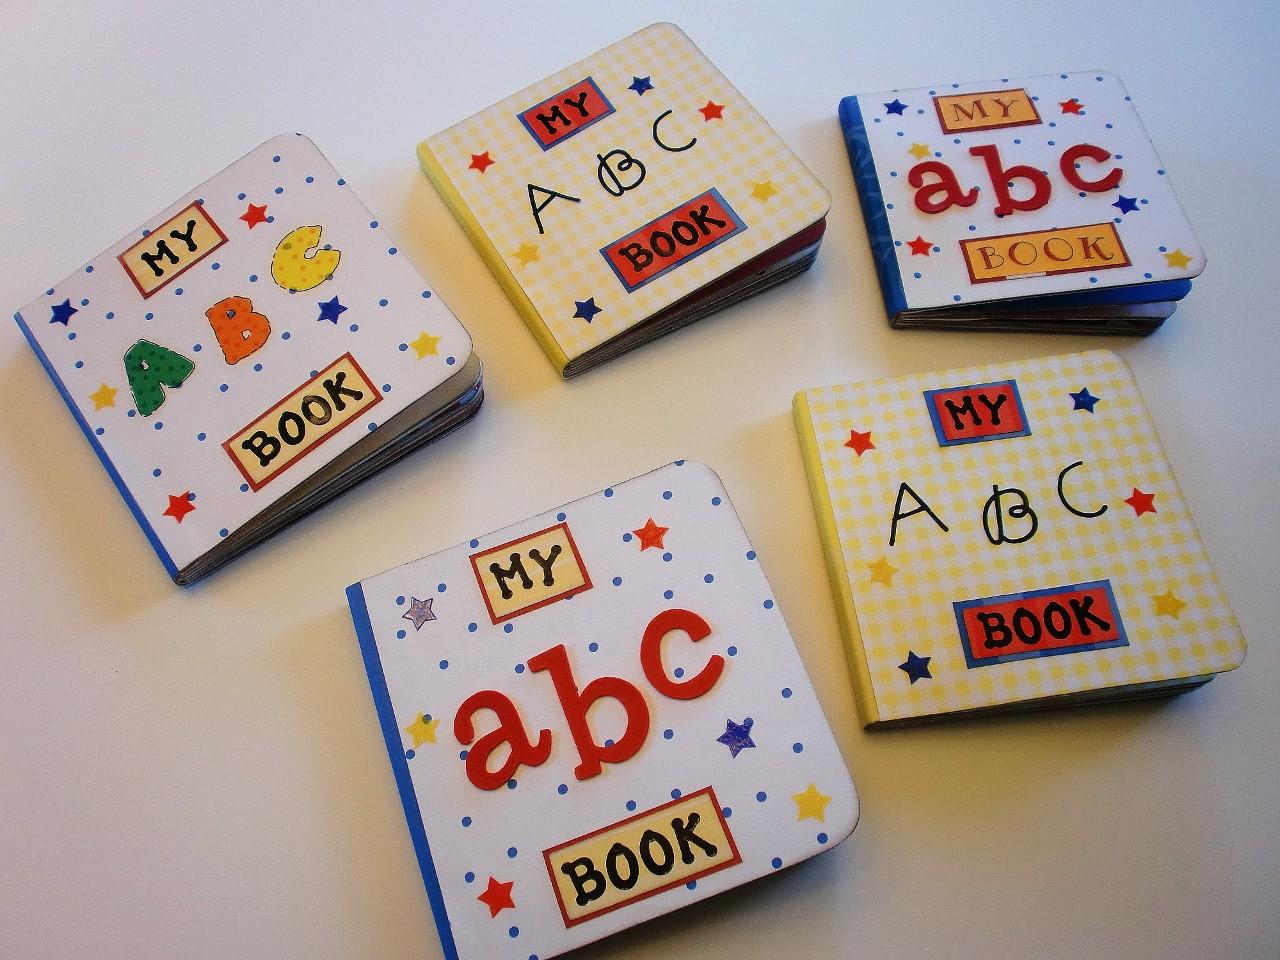 Project ABC